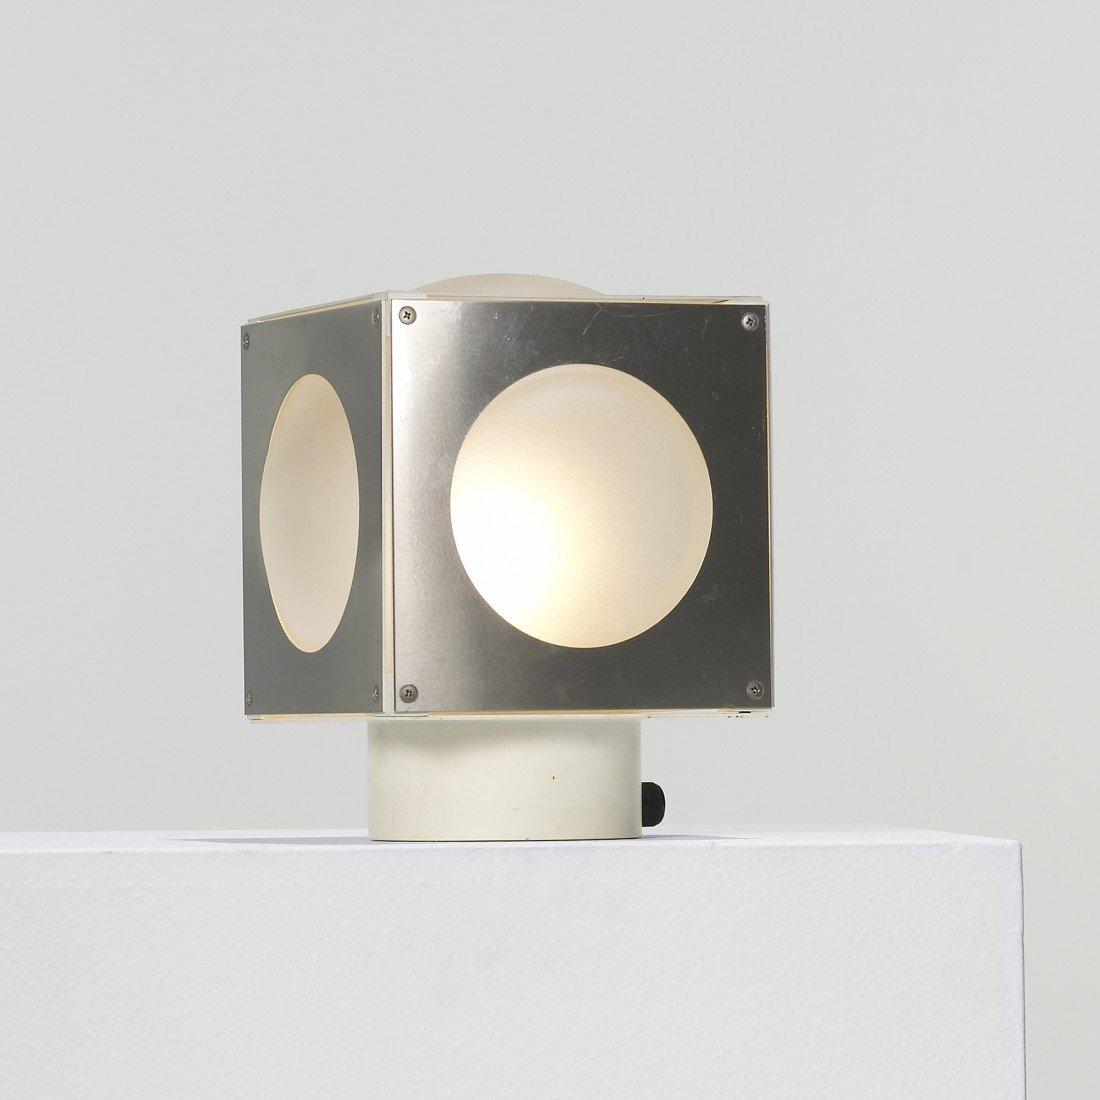 185: Angelo Lelli table lamp, model 14034